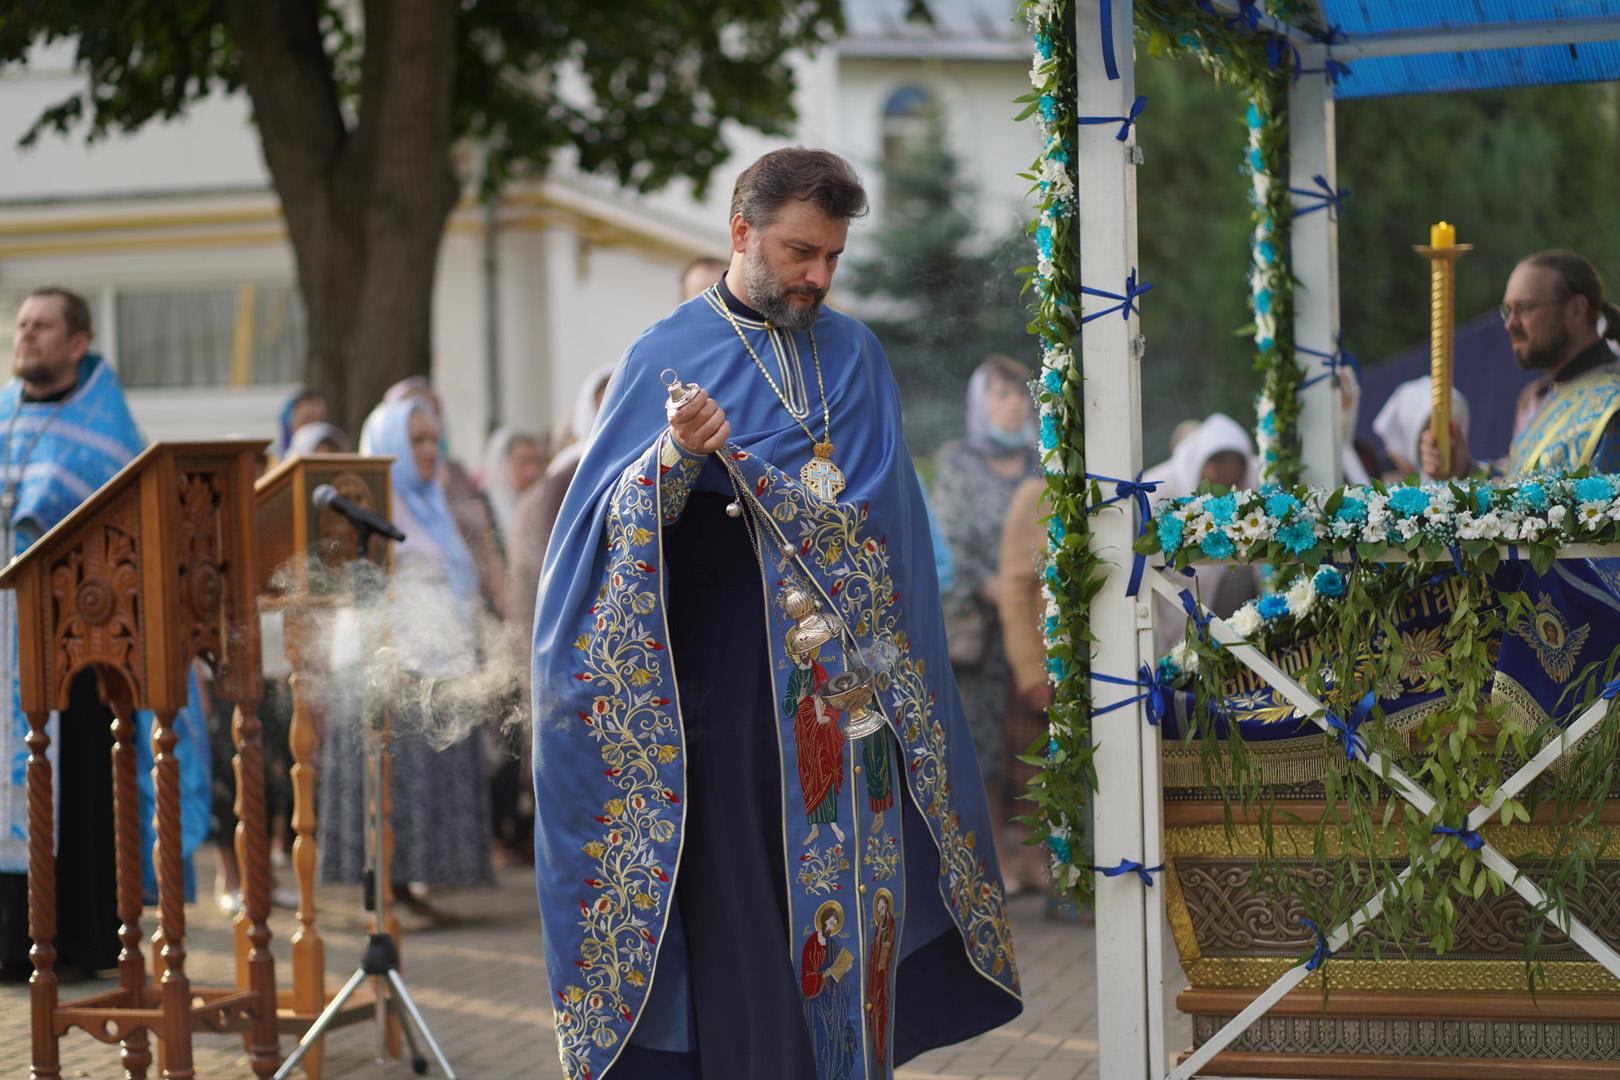 http://monuspen.ru/photoreports/eb9de00e1f5615849ea00b127bfcb98k.jpg